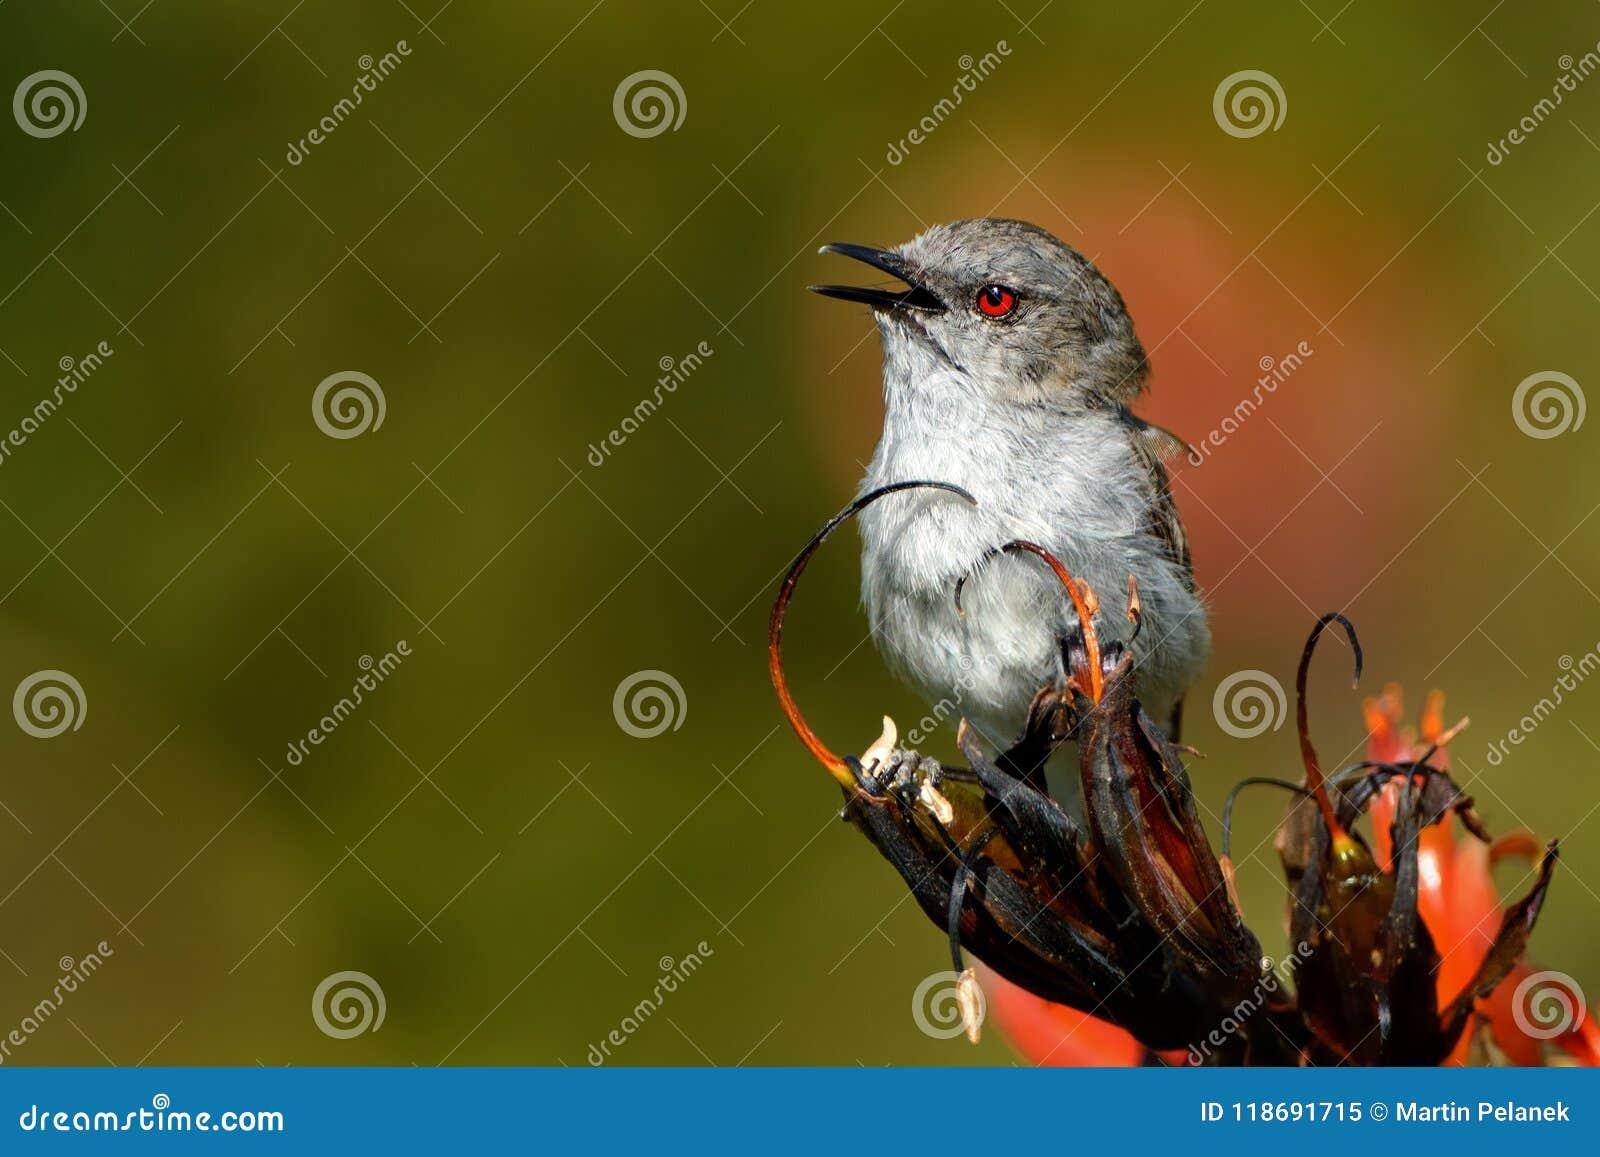 Grey warbler - Gerygone igata - riroriro common small bird from New Zealand